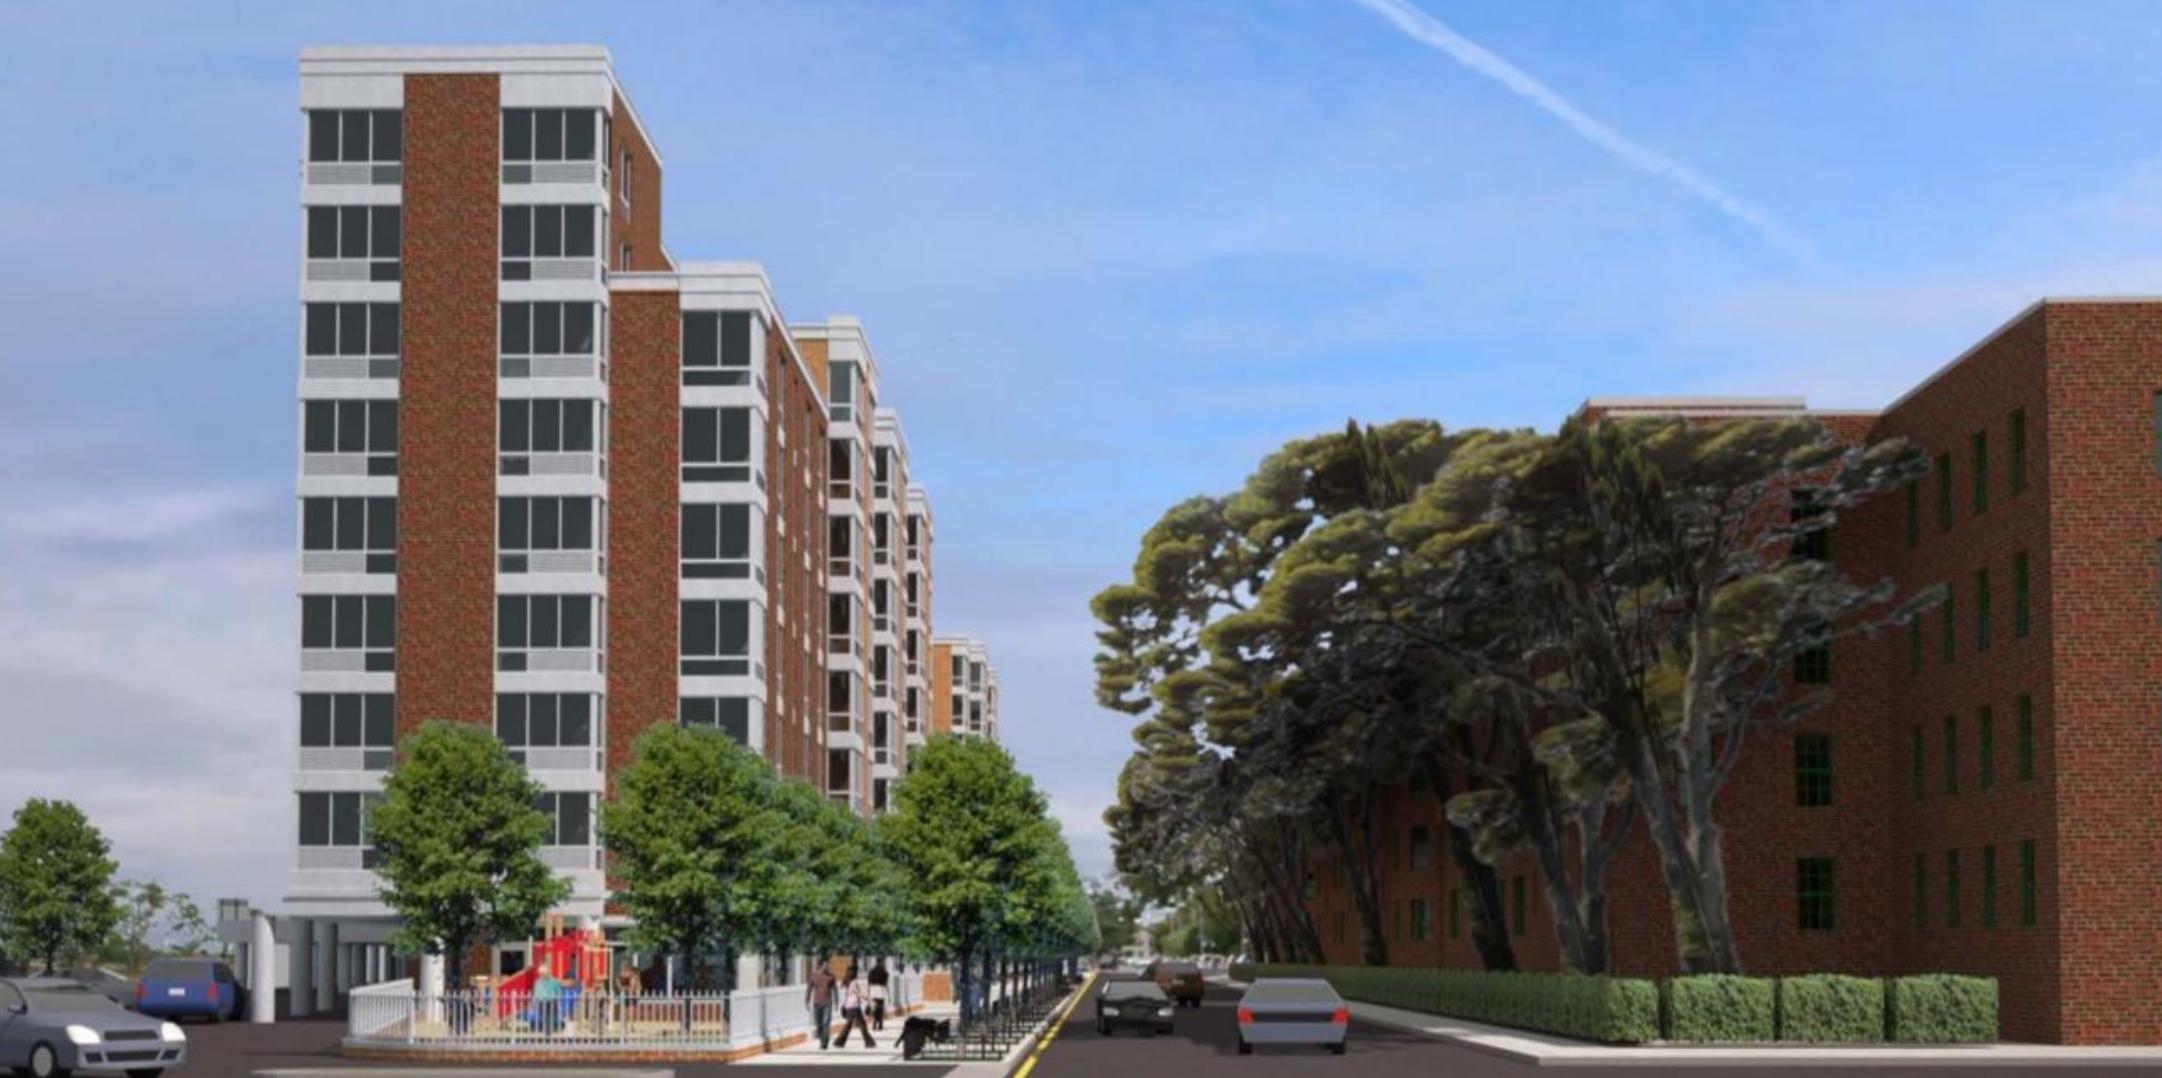 50-25 Barnett Avenue, rendering by MHG Architects via DCP